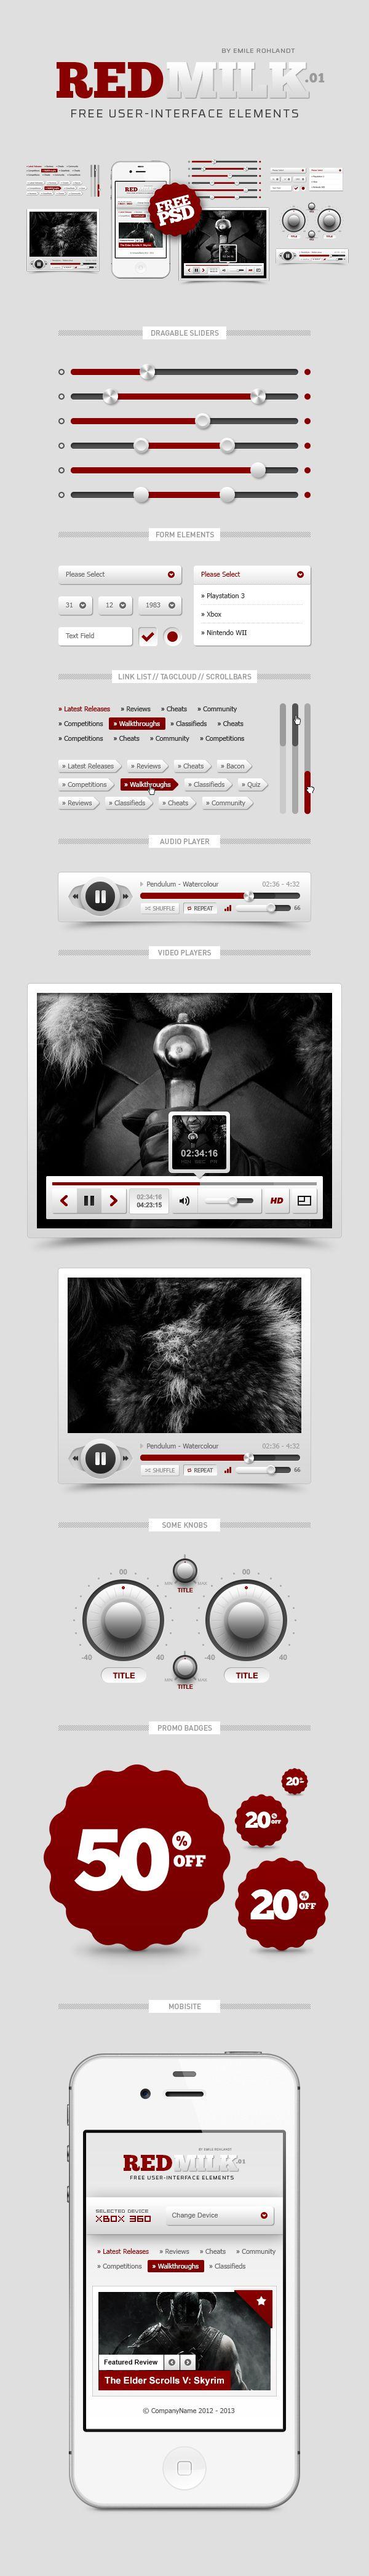 REDMILK FREE #UI Elements (PSD) by Emile Rohlandt, via #Behance